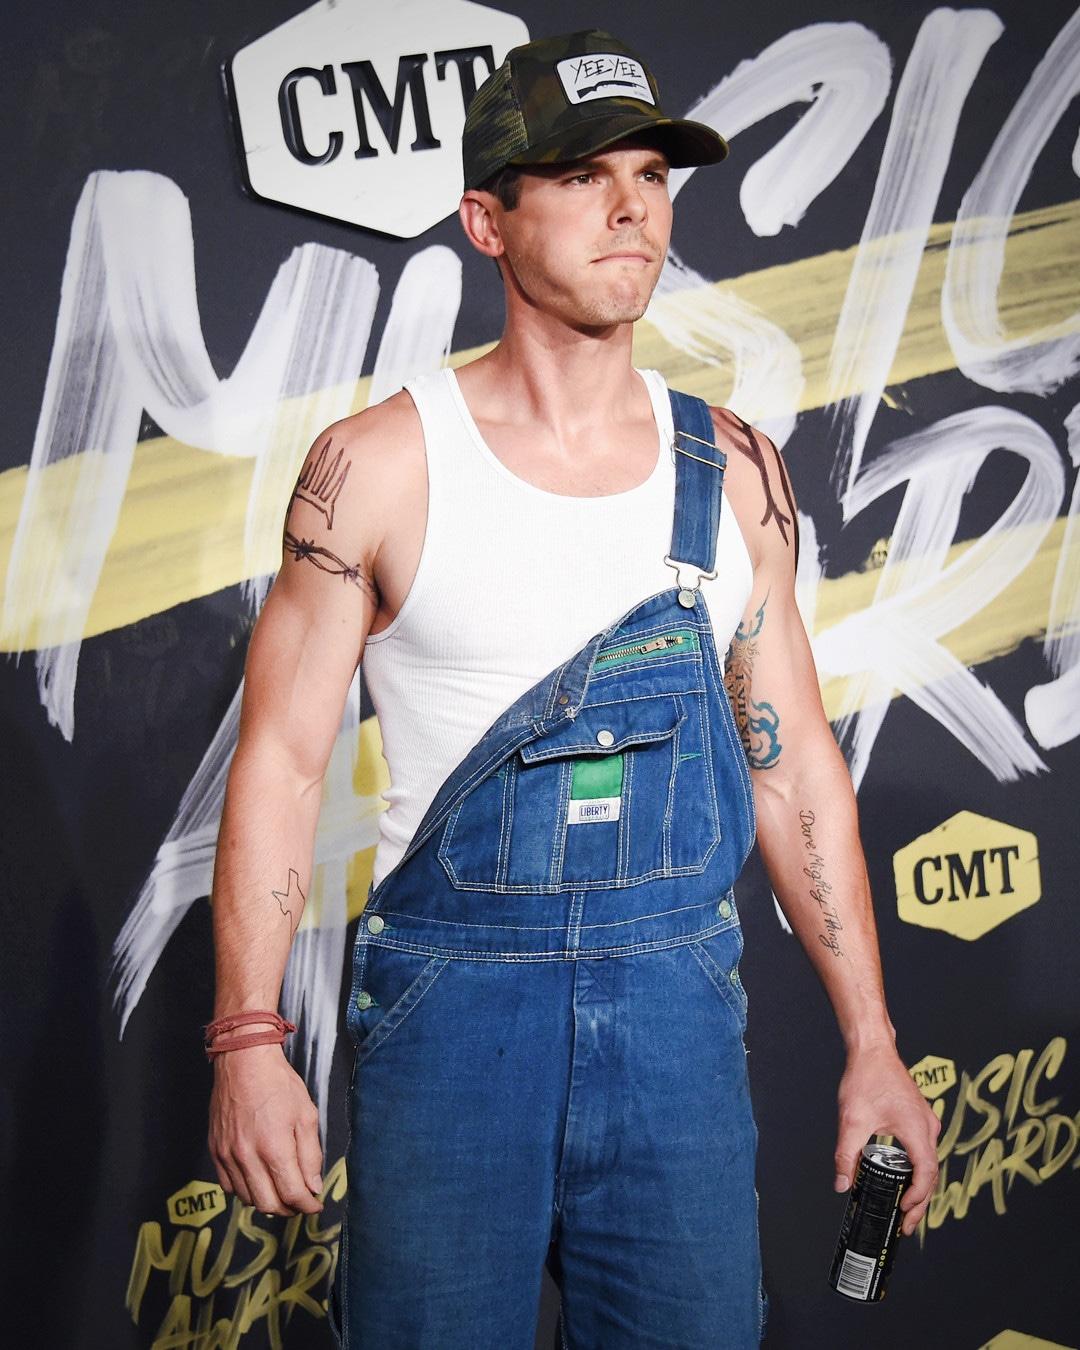 ESC: Earl Dibbles Jr., 2018 CMT Music Awards